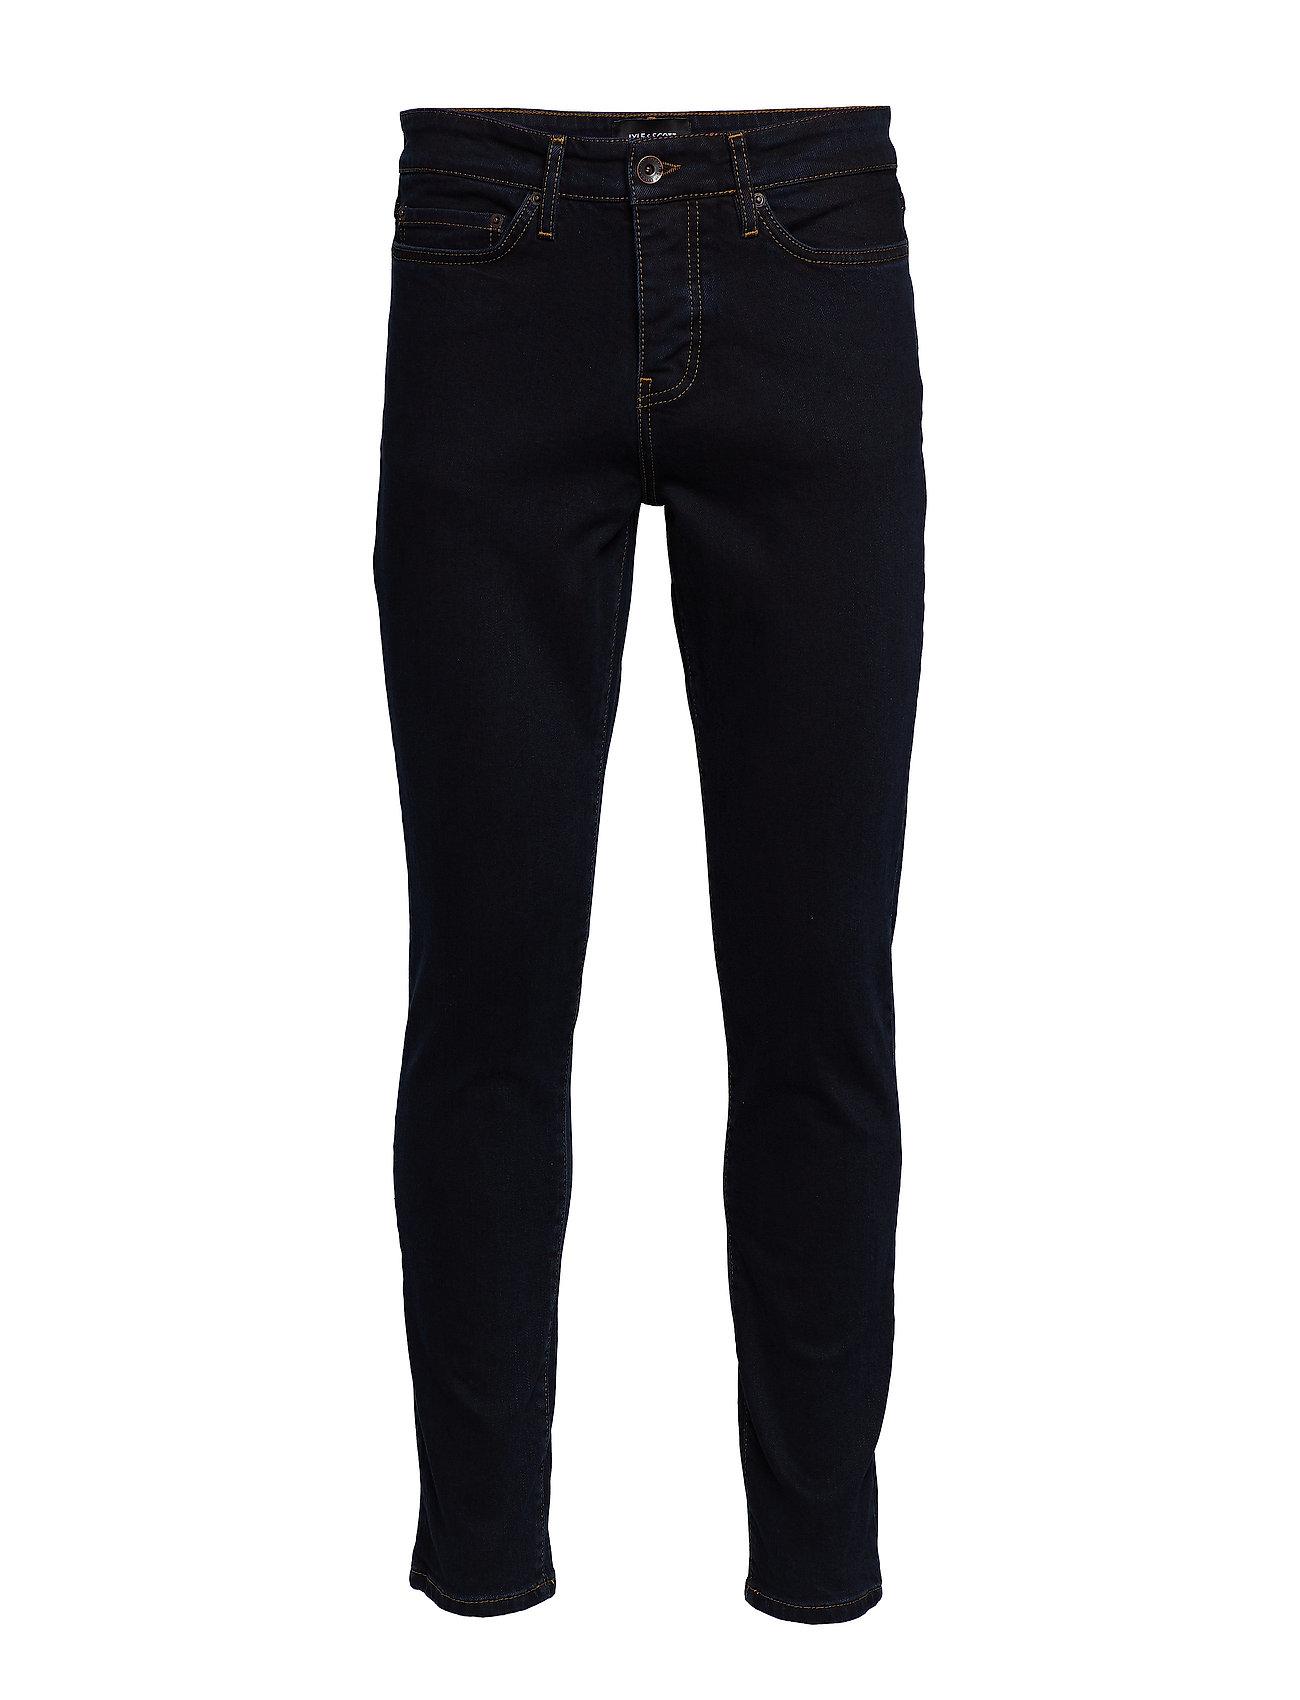 Image of Slim Fit Jean Skinny Jeans Blå Lyle & Scott (3498046875)